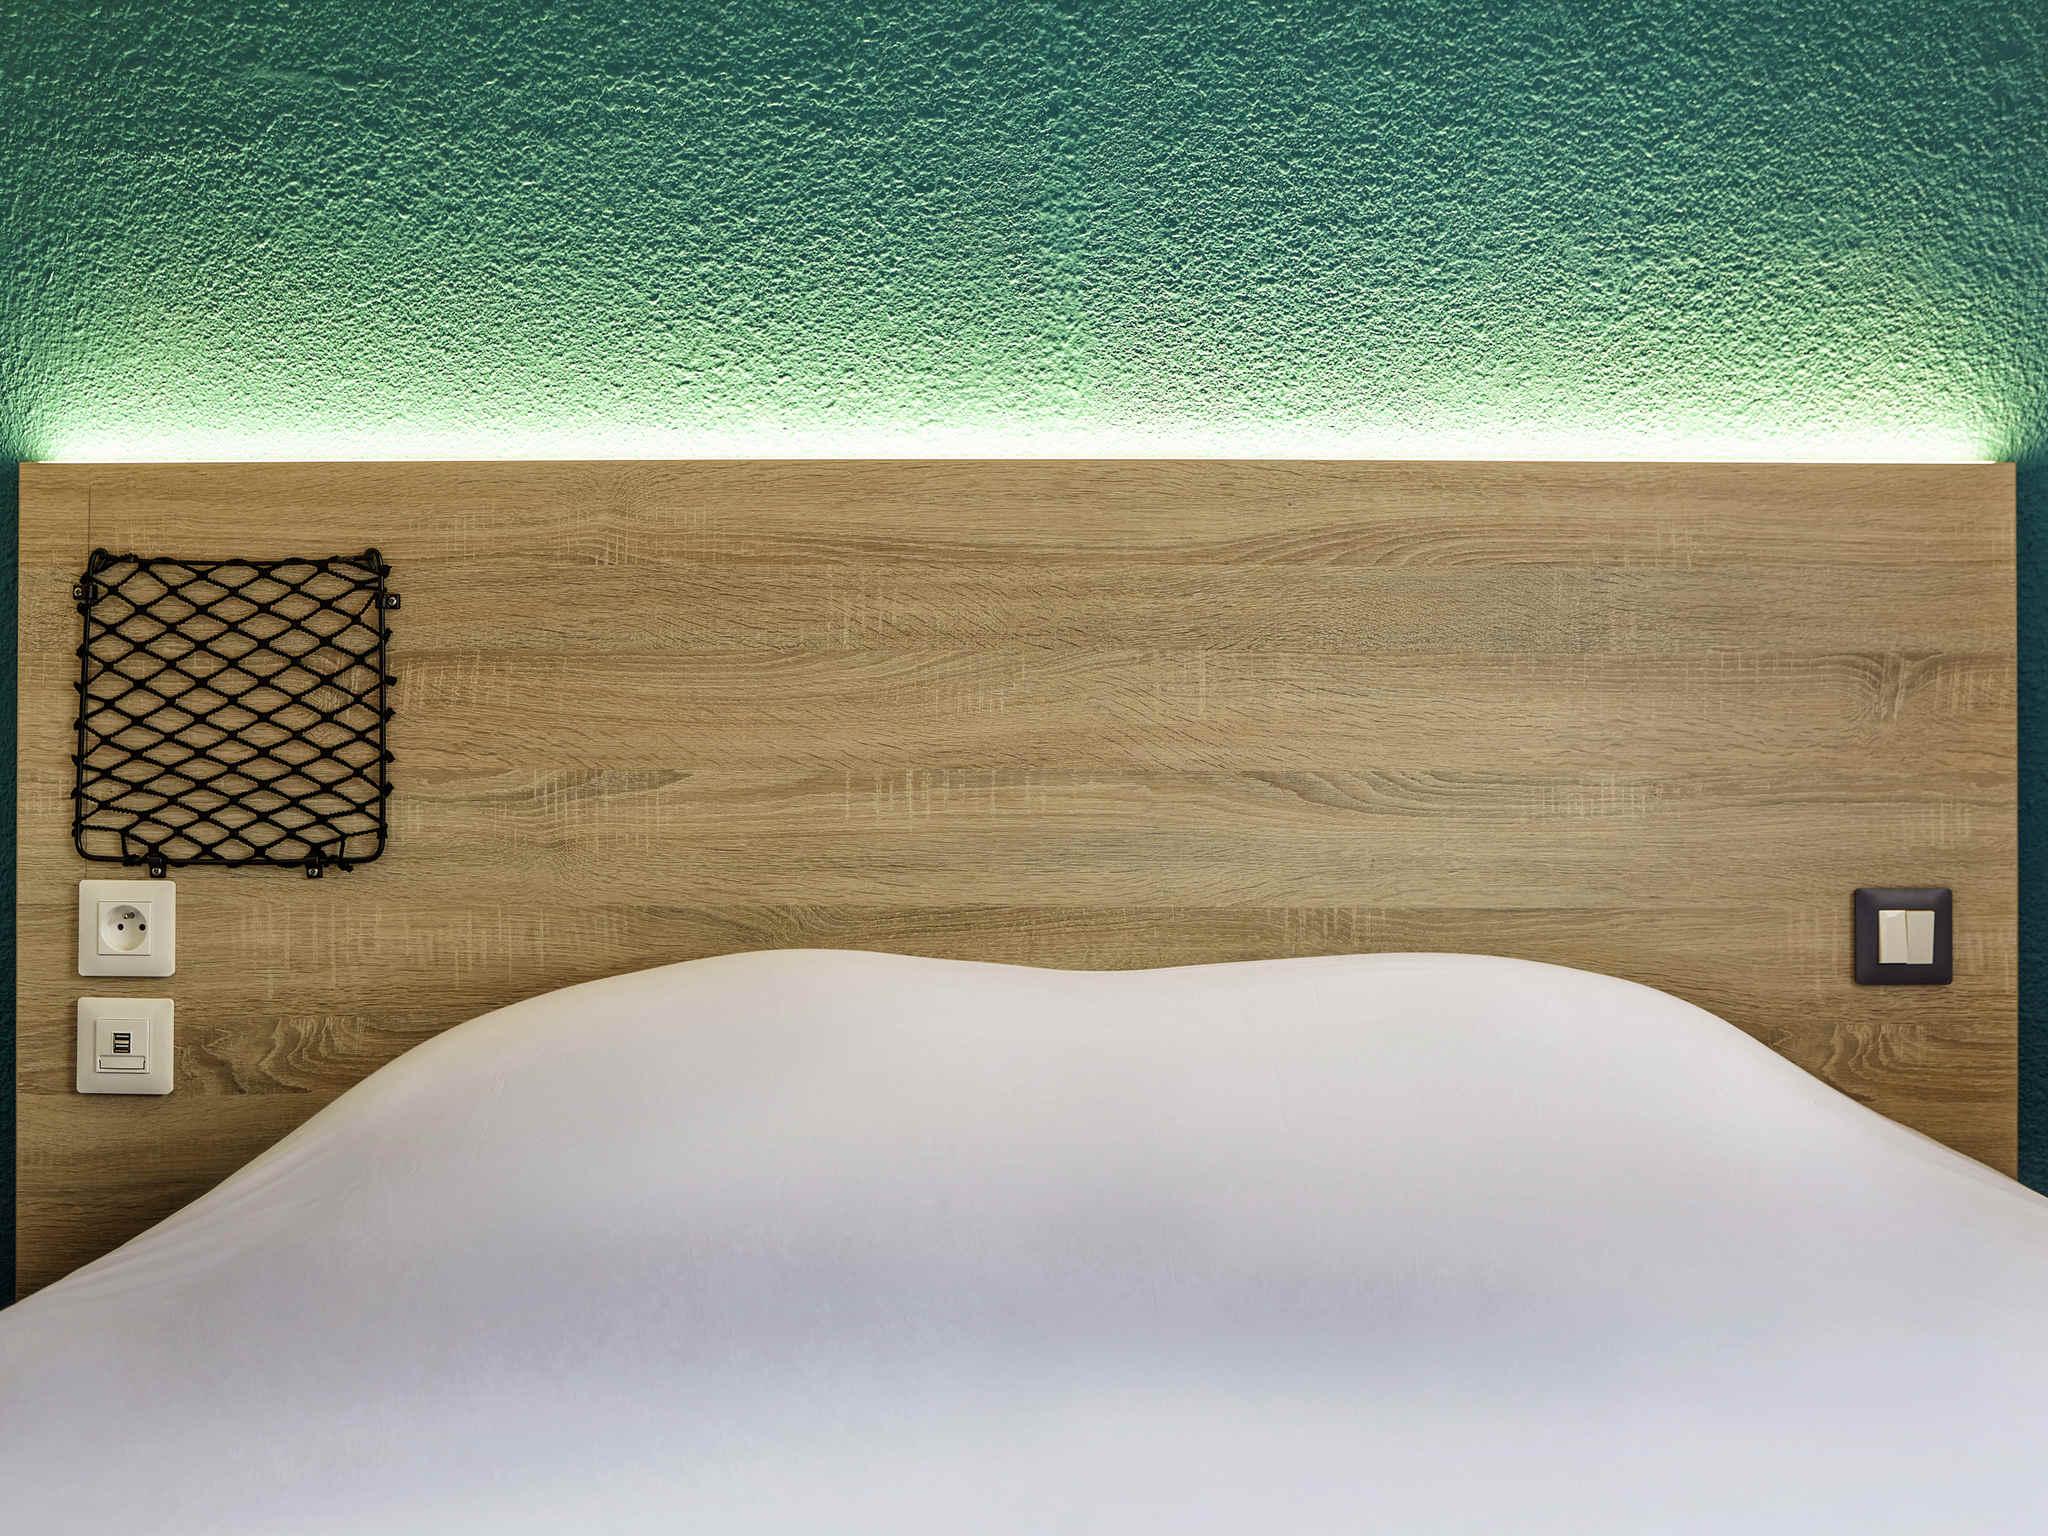 hotel in villenave d 39 ornon hotelf1 bordeaux sud villenave d 39 ornon. Black Bedroom Furniture Sets. Home Design Ideas